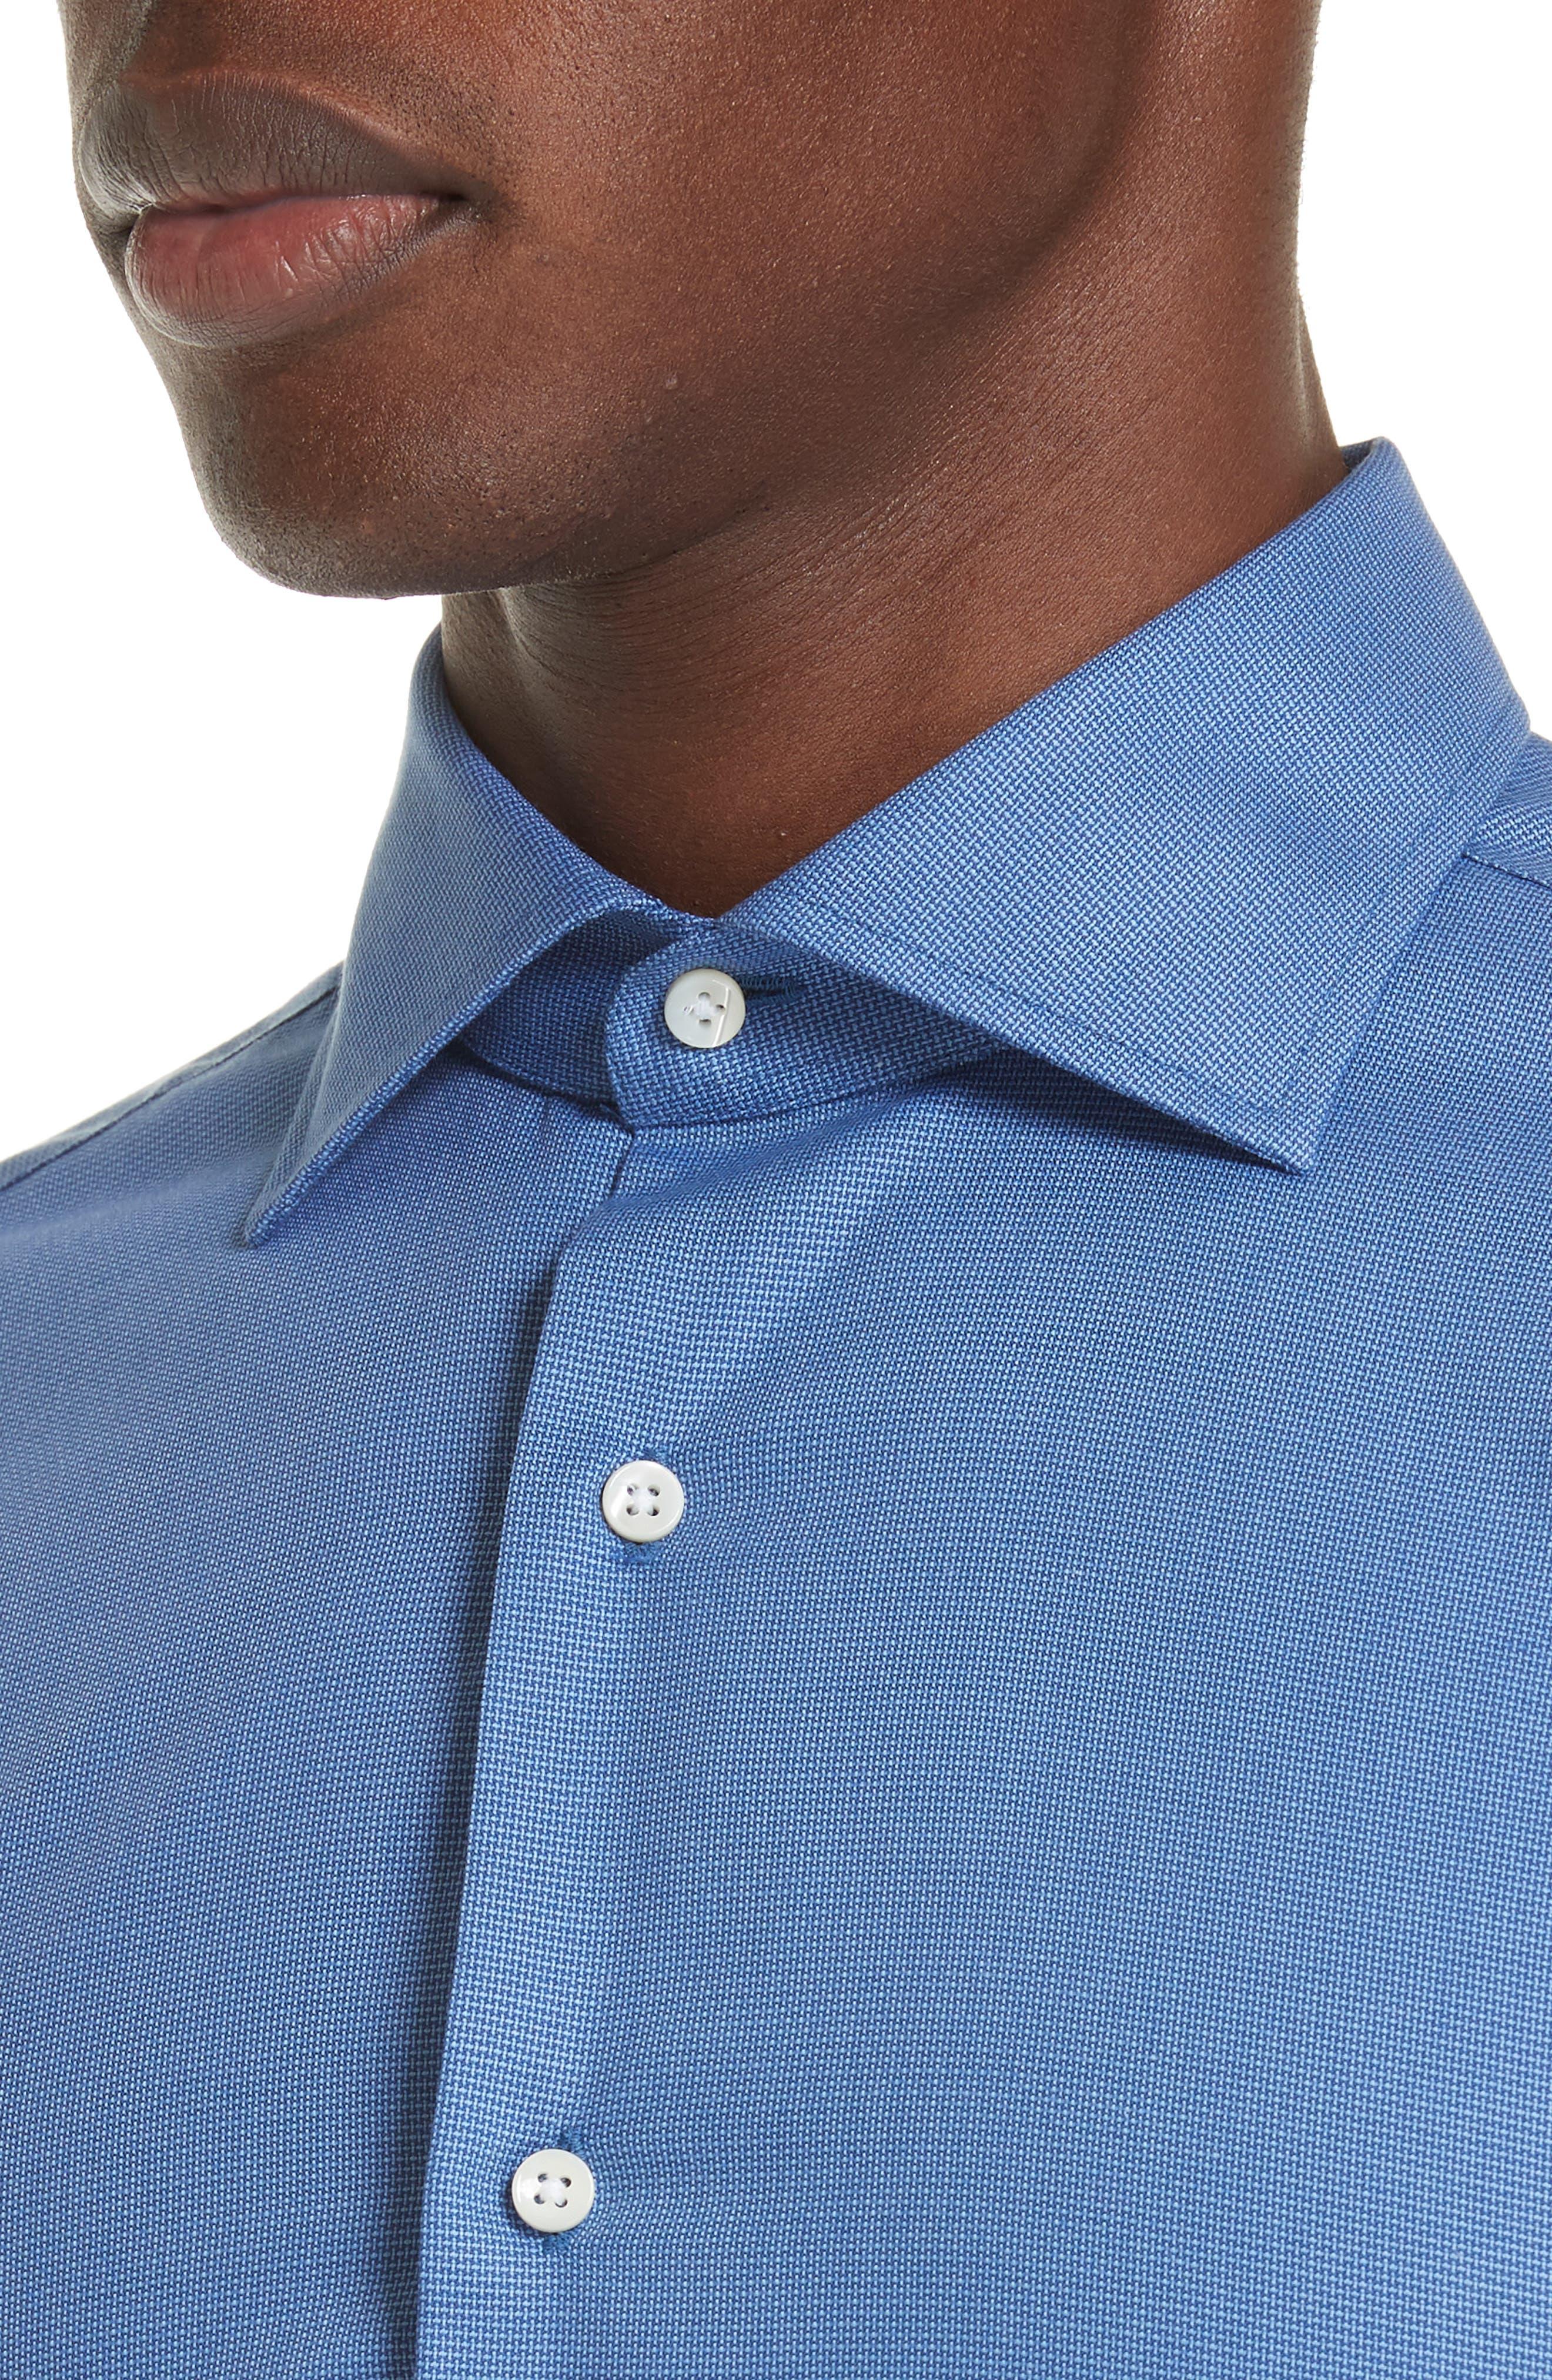 Trim Fit Dress Shirt,                             Alternate thumbnail 2, color,                             DARK BLUE